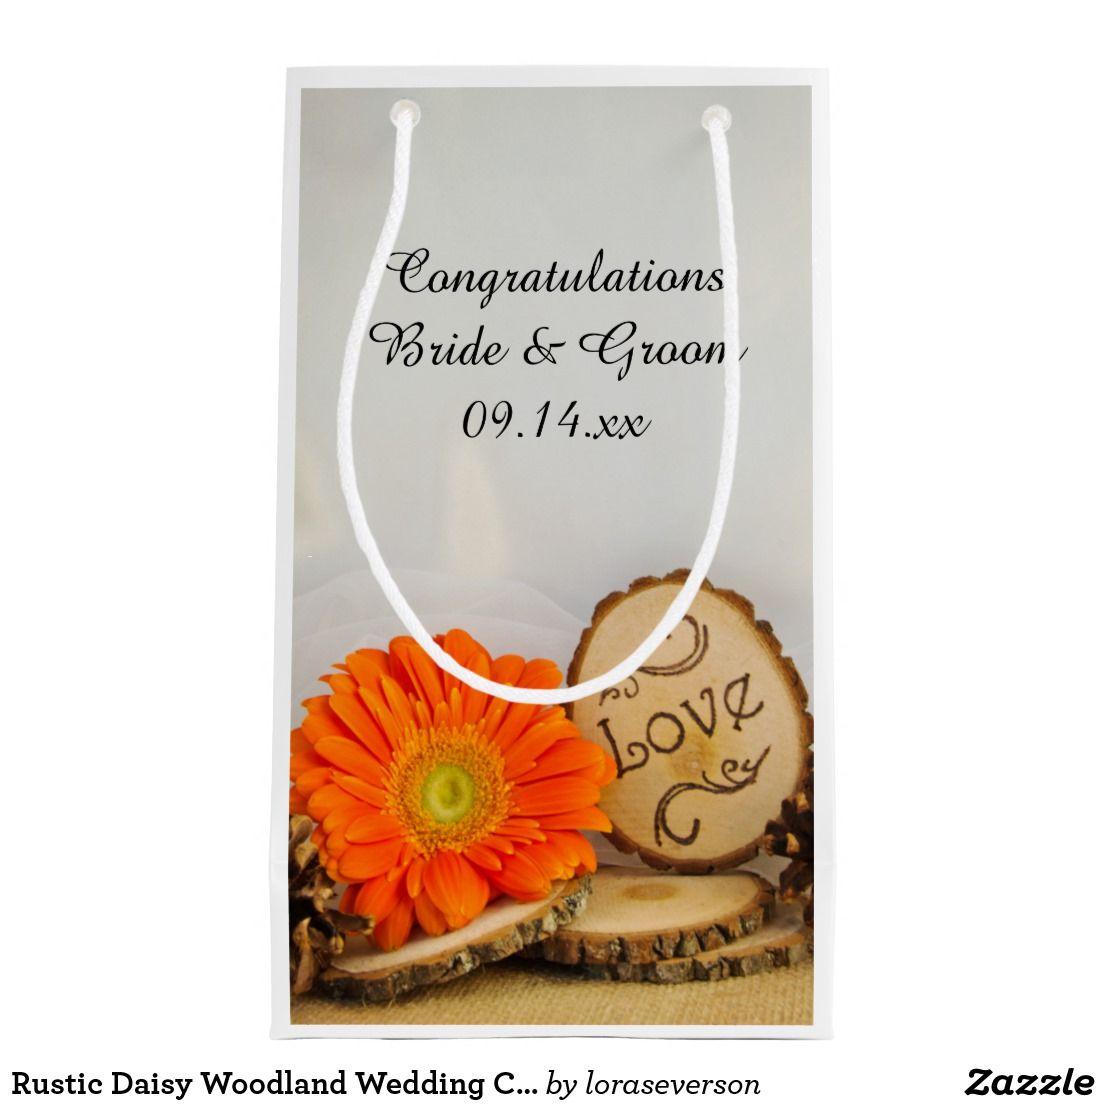 Rustic Daisy Woodland Wedding Congratulations Small Gift Bag   Small ...